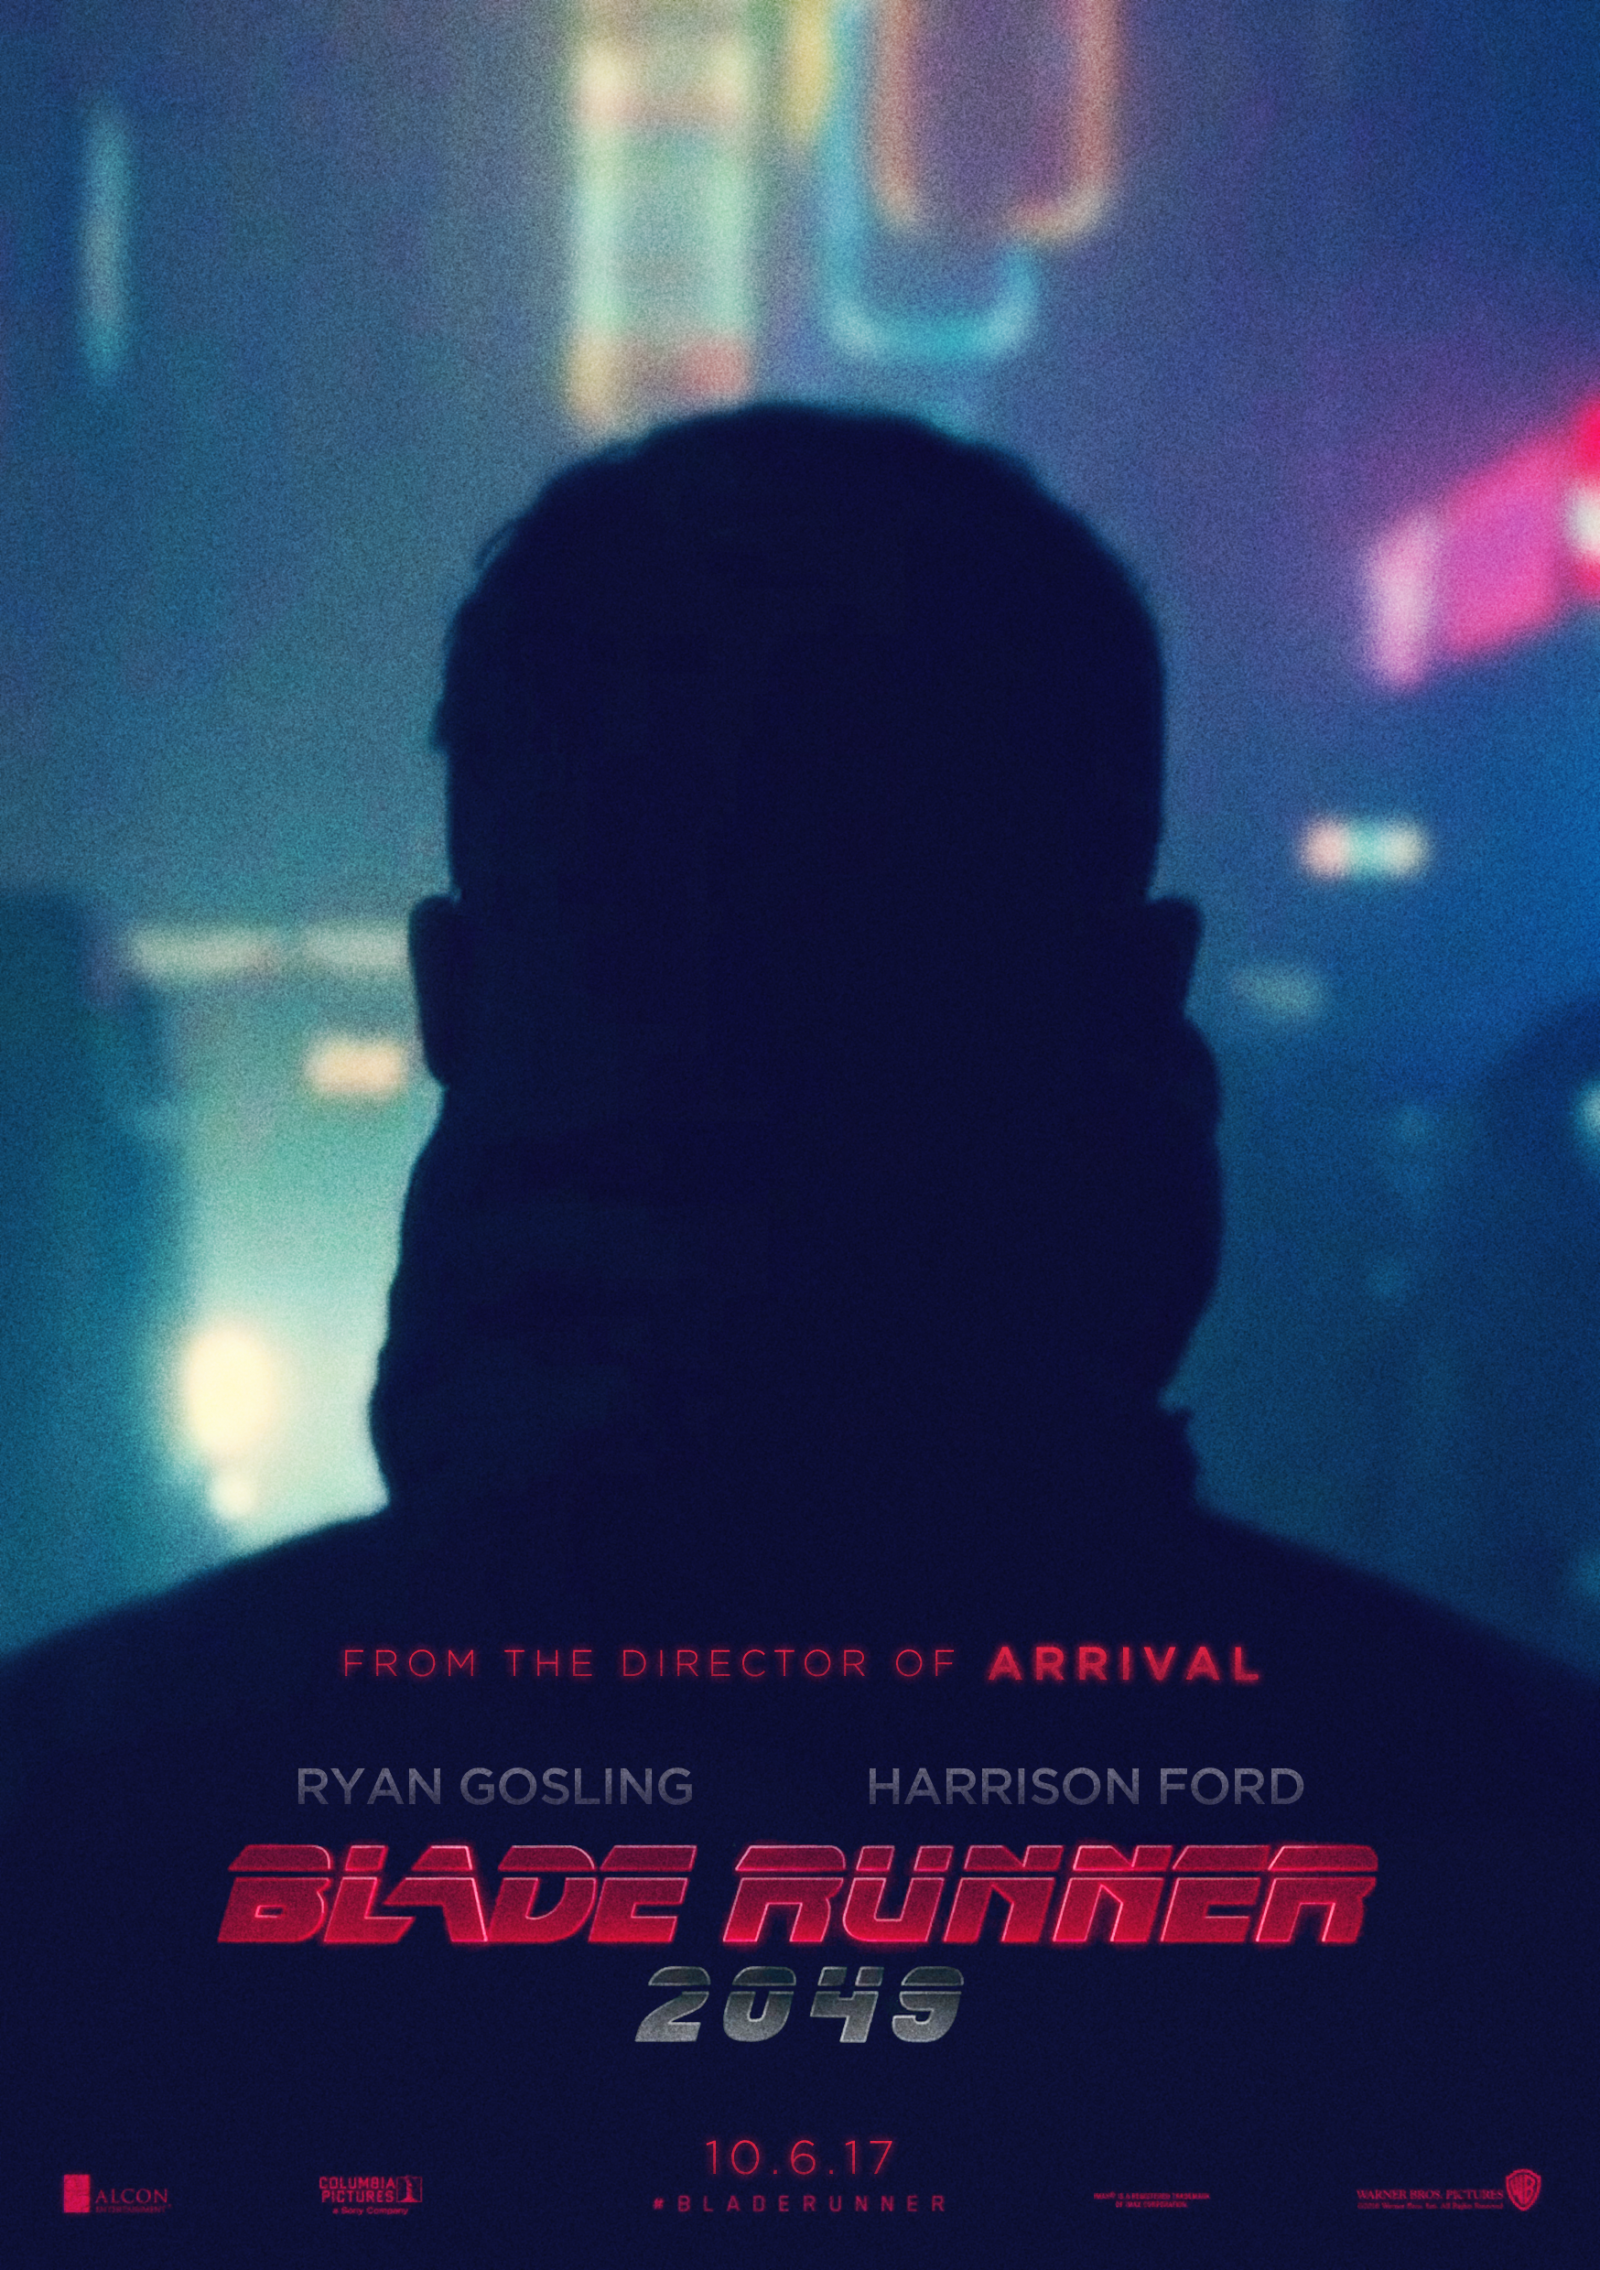 blade runner final cut streaming online free